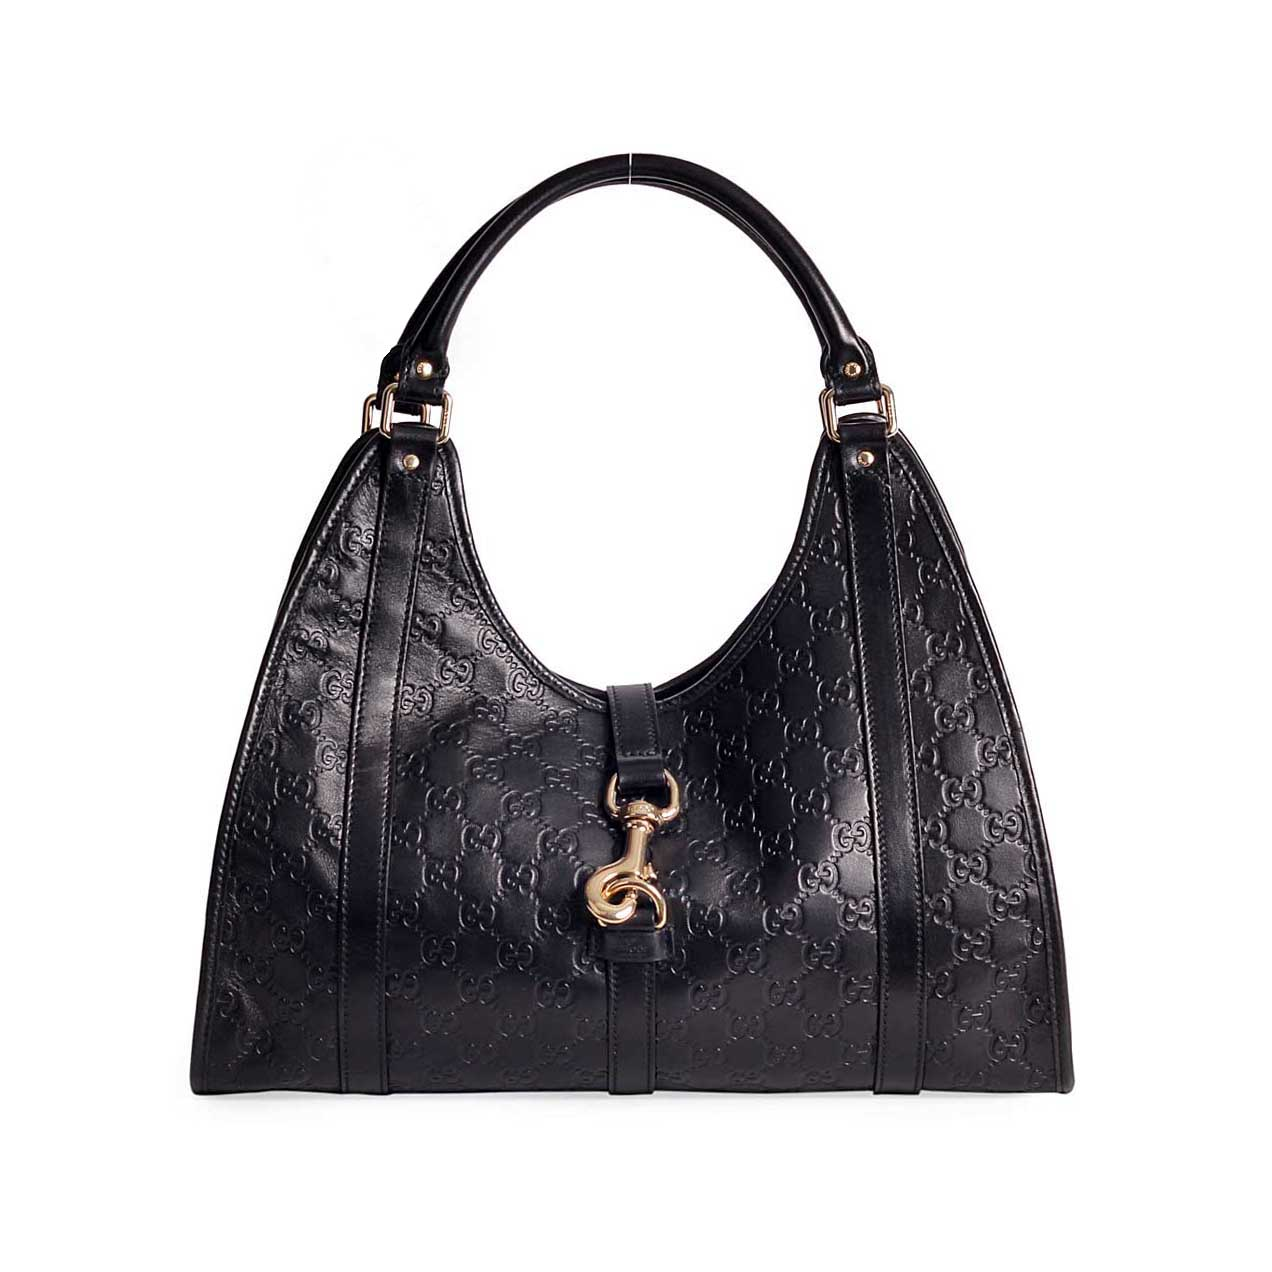 anders neuer Lebensstil gut aussehend GUCCI Guccissima Black Leather Medium Joy Shoulder Bag - NEW